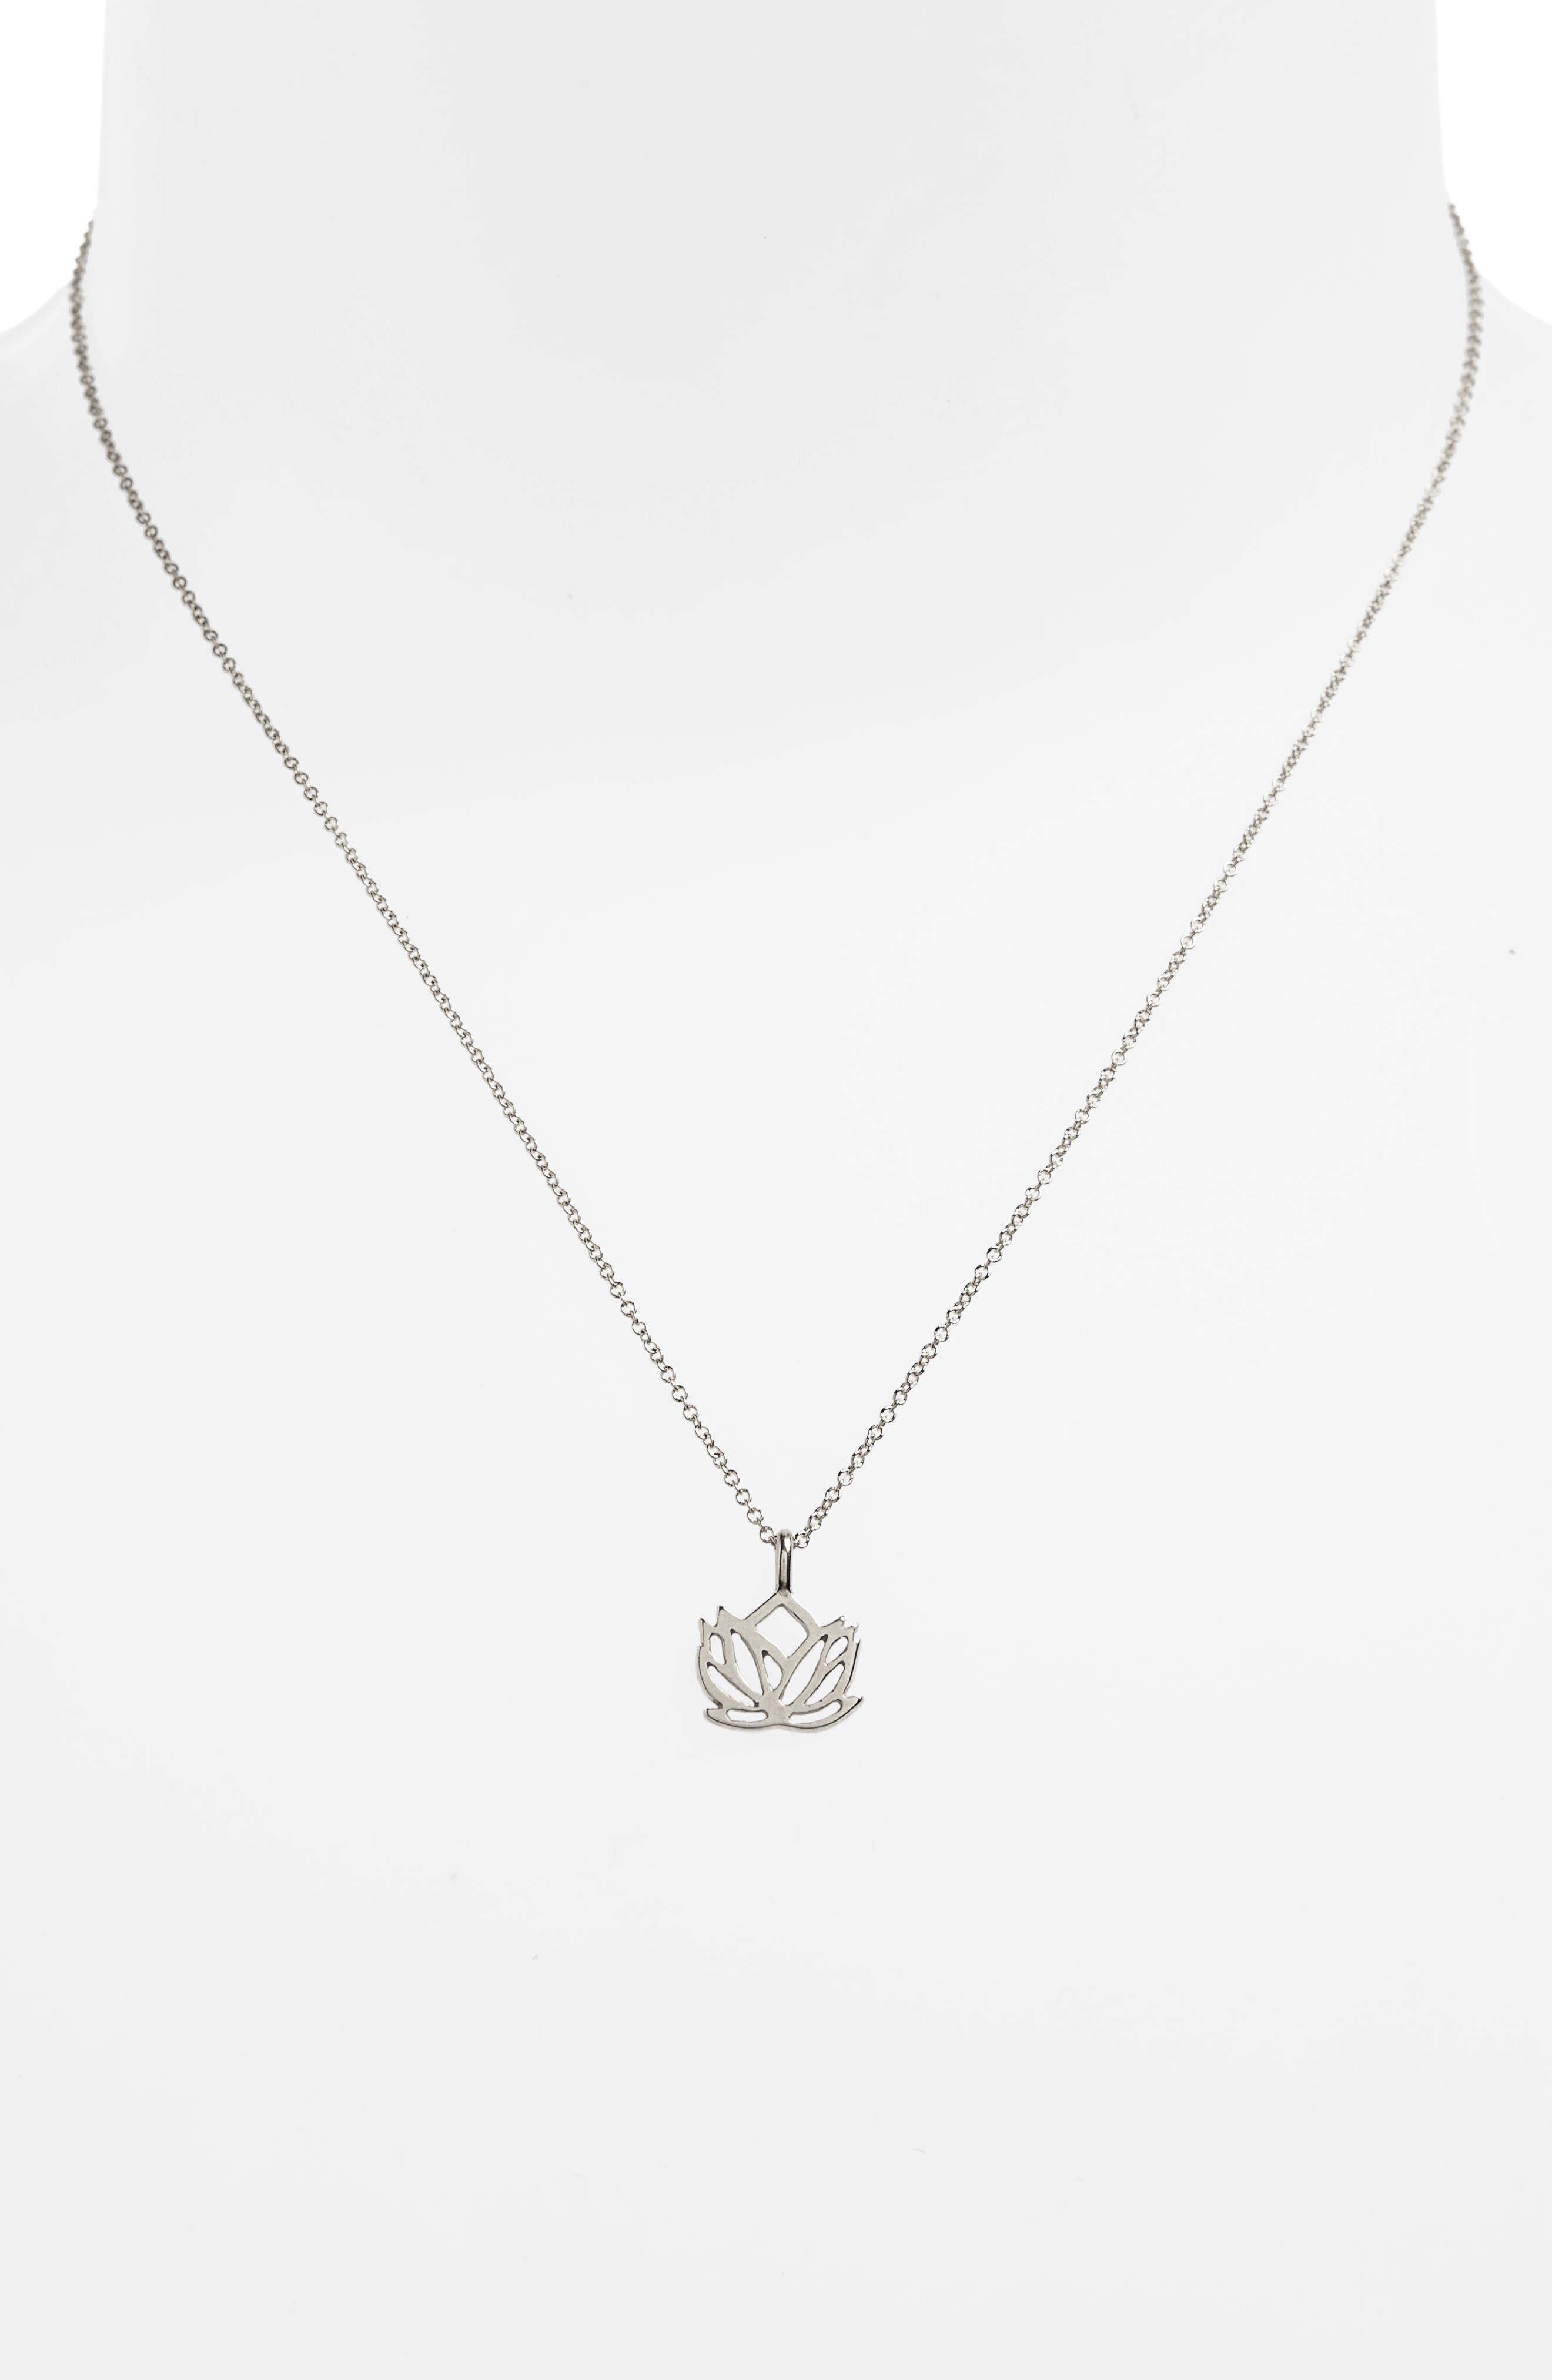 Lotus Reminder Pendant Necklace,                             Alternate thumbnail 3, color,                             042